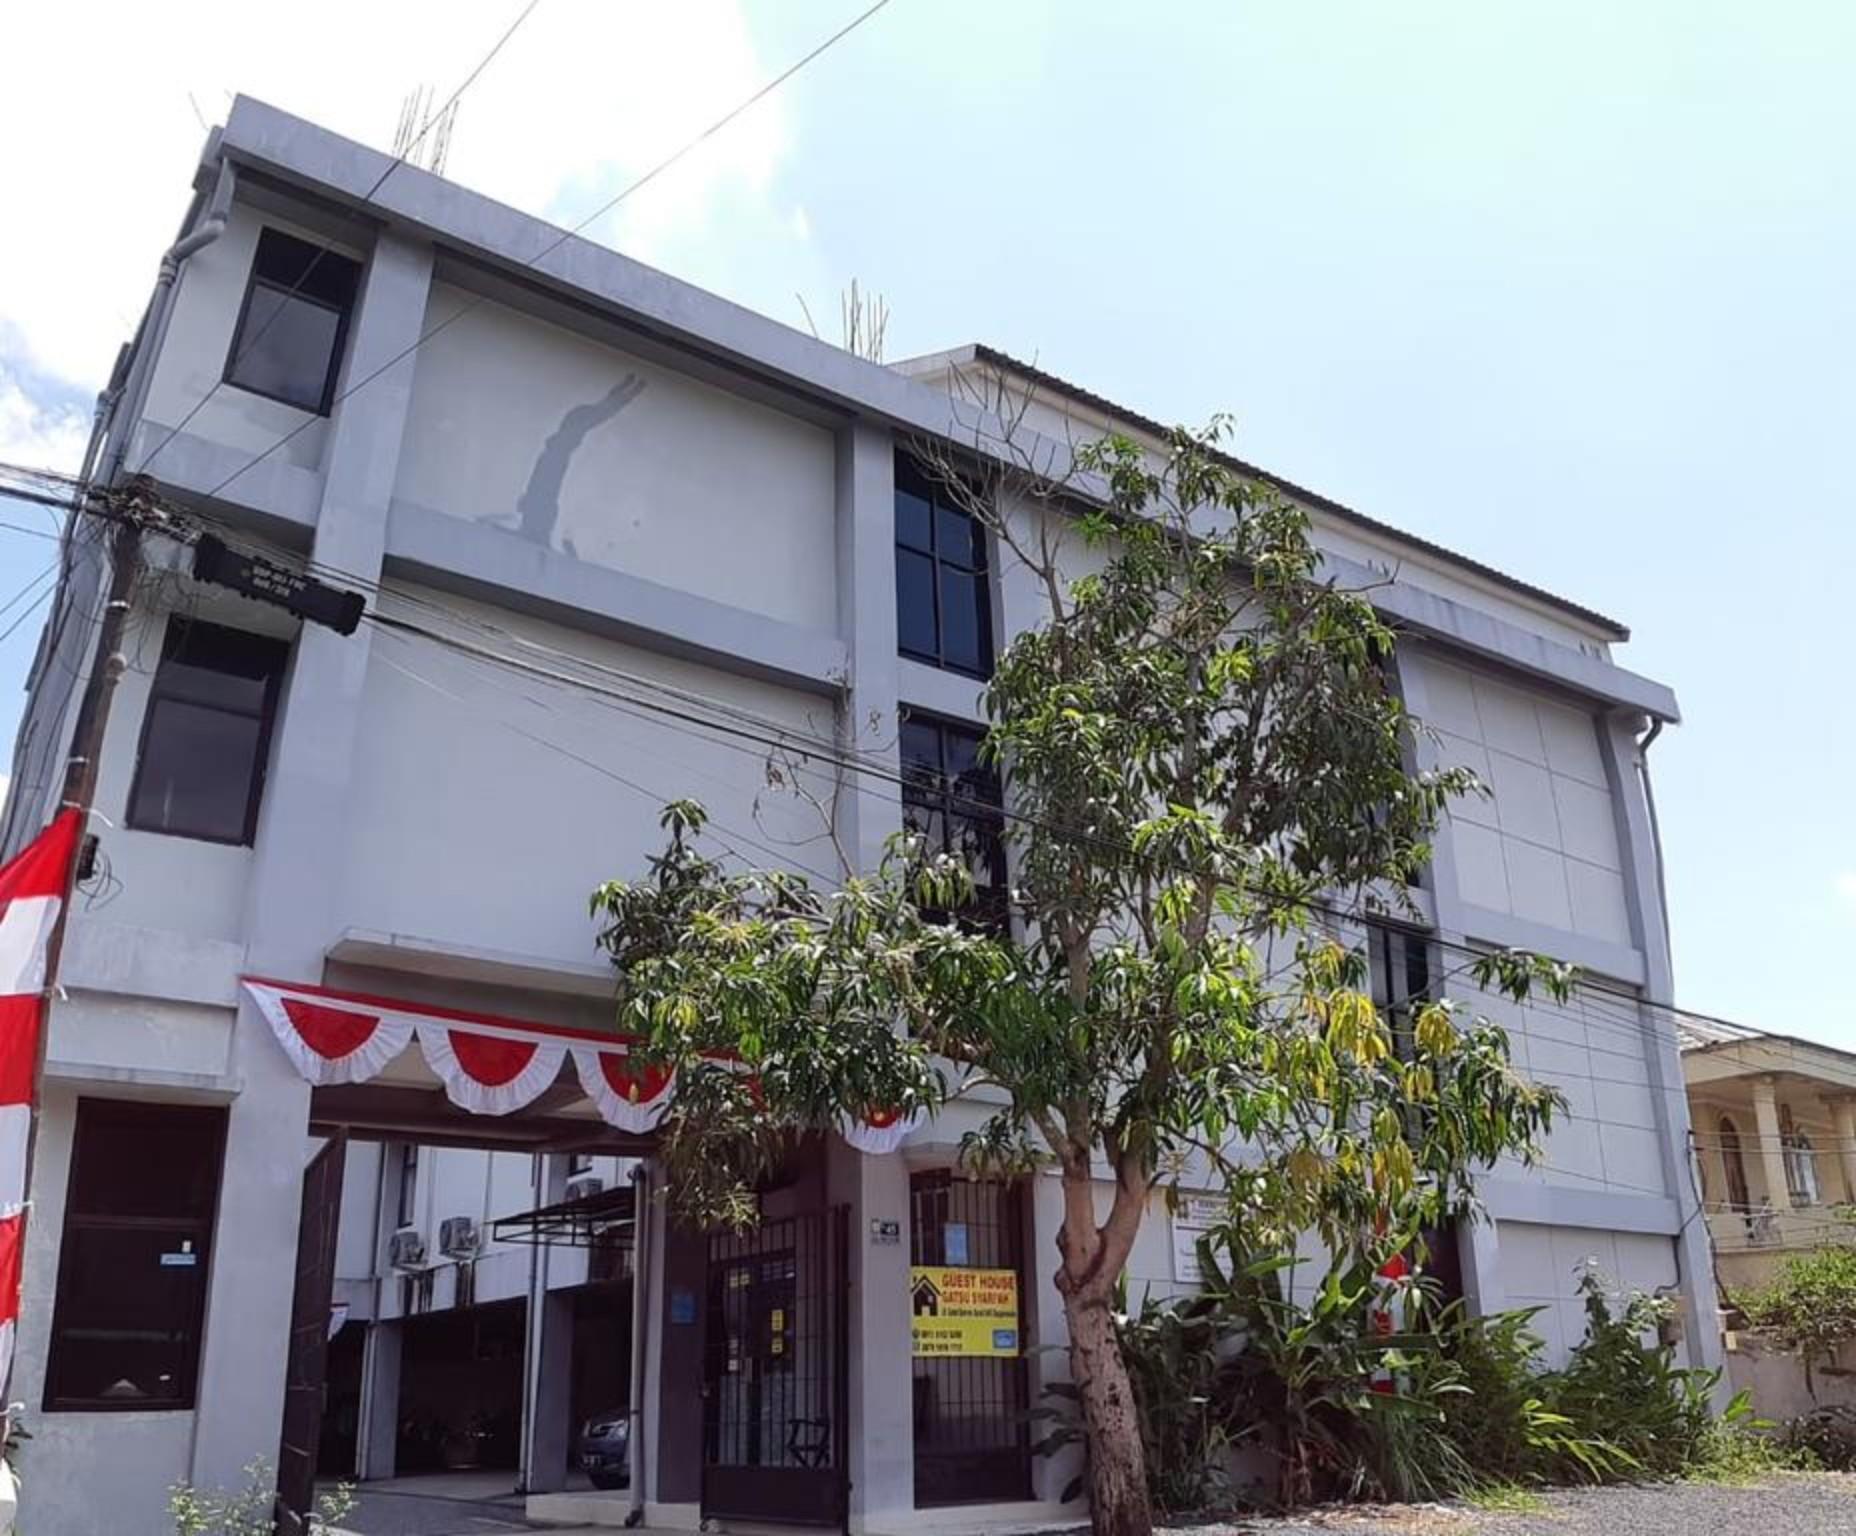 Lokasi Gatsu 2 Syariah Guest House Jl. Gatot Subroto Barat II No.45, RT 20, RW 02, Banjarmasin Timur, Banjarmasin